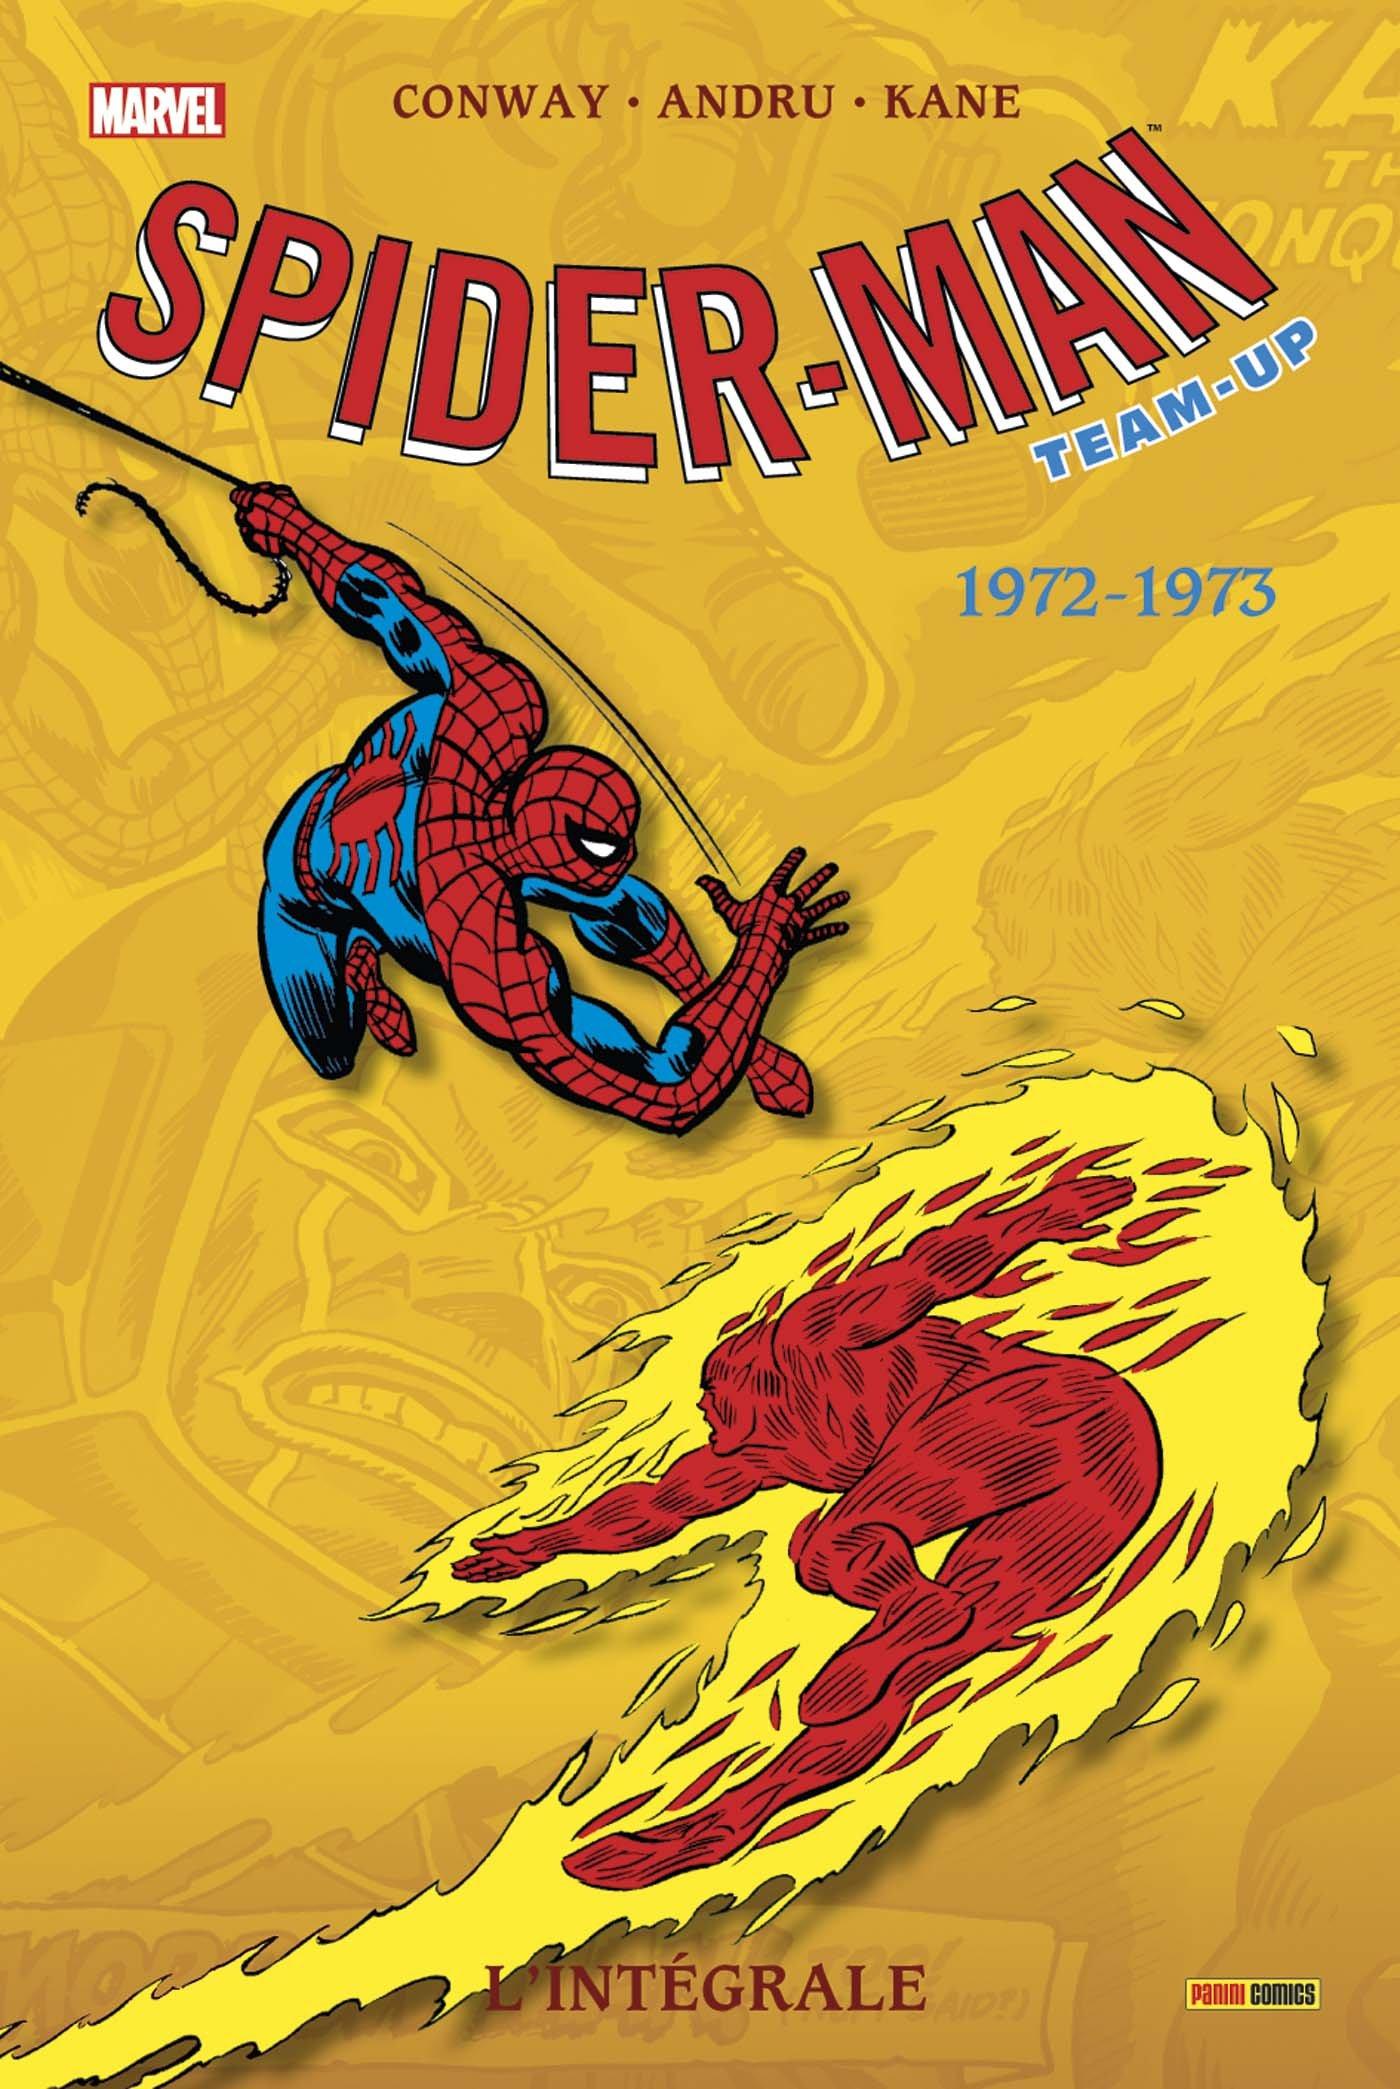 SPIDER-MAN TEAM UP L'INTEGRALE 1972-1973 (NOUVELLE EDITION)